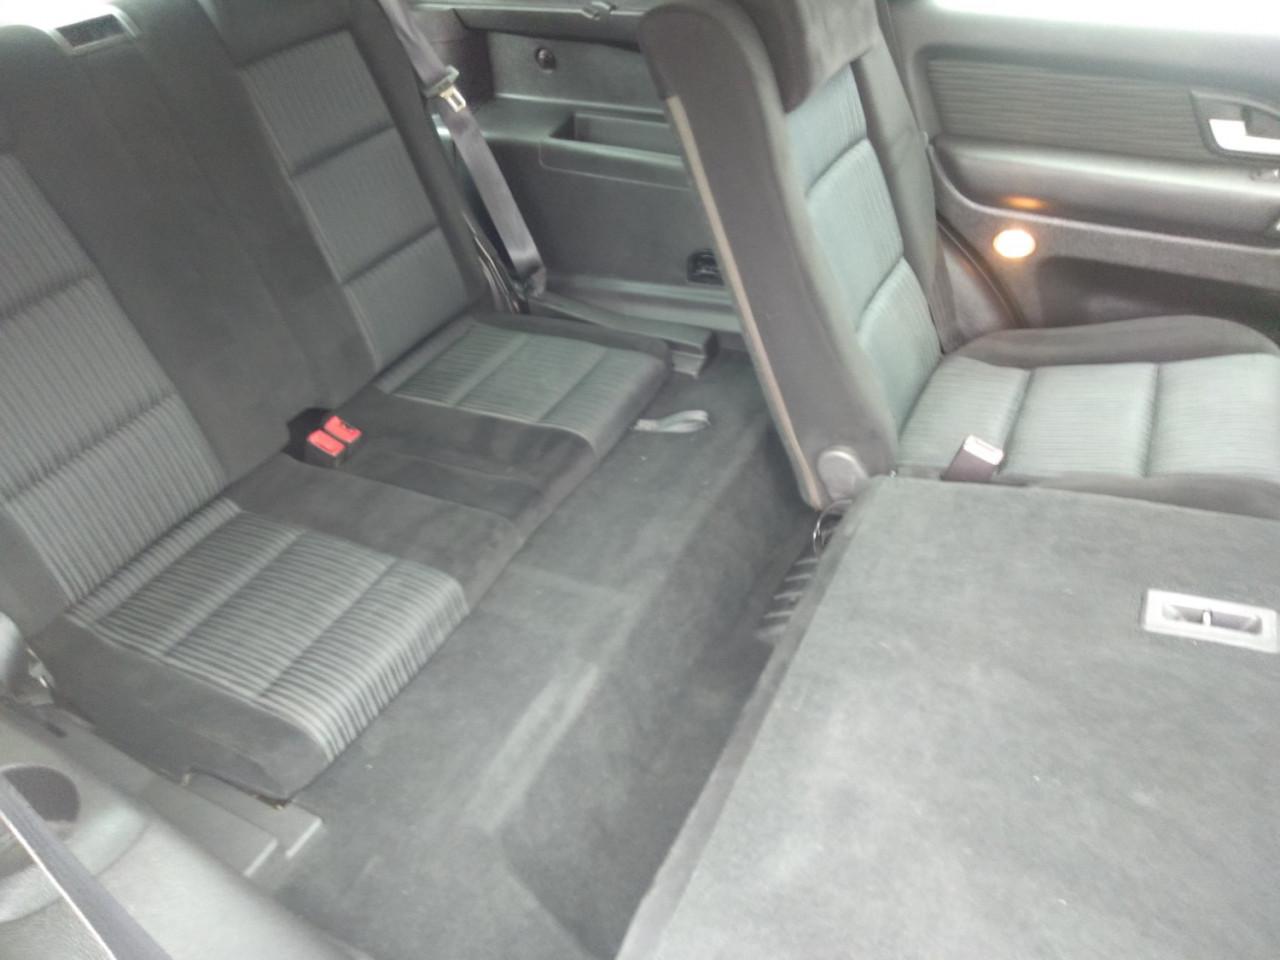 2013 Ford Territory SZ TS Wagon Image 11